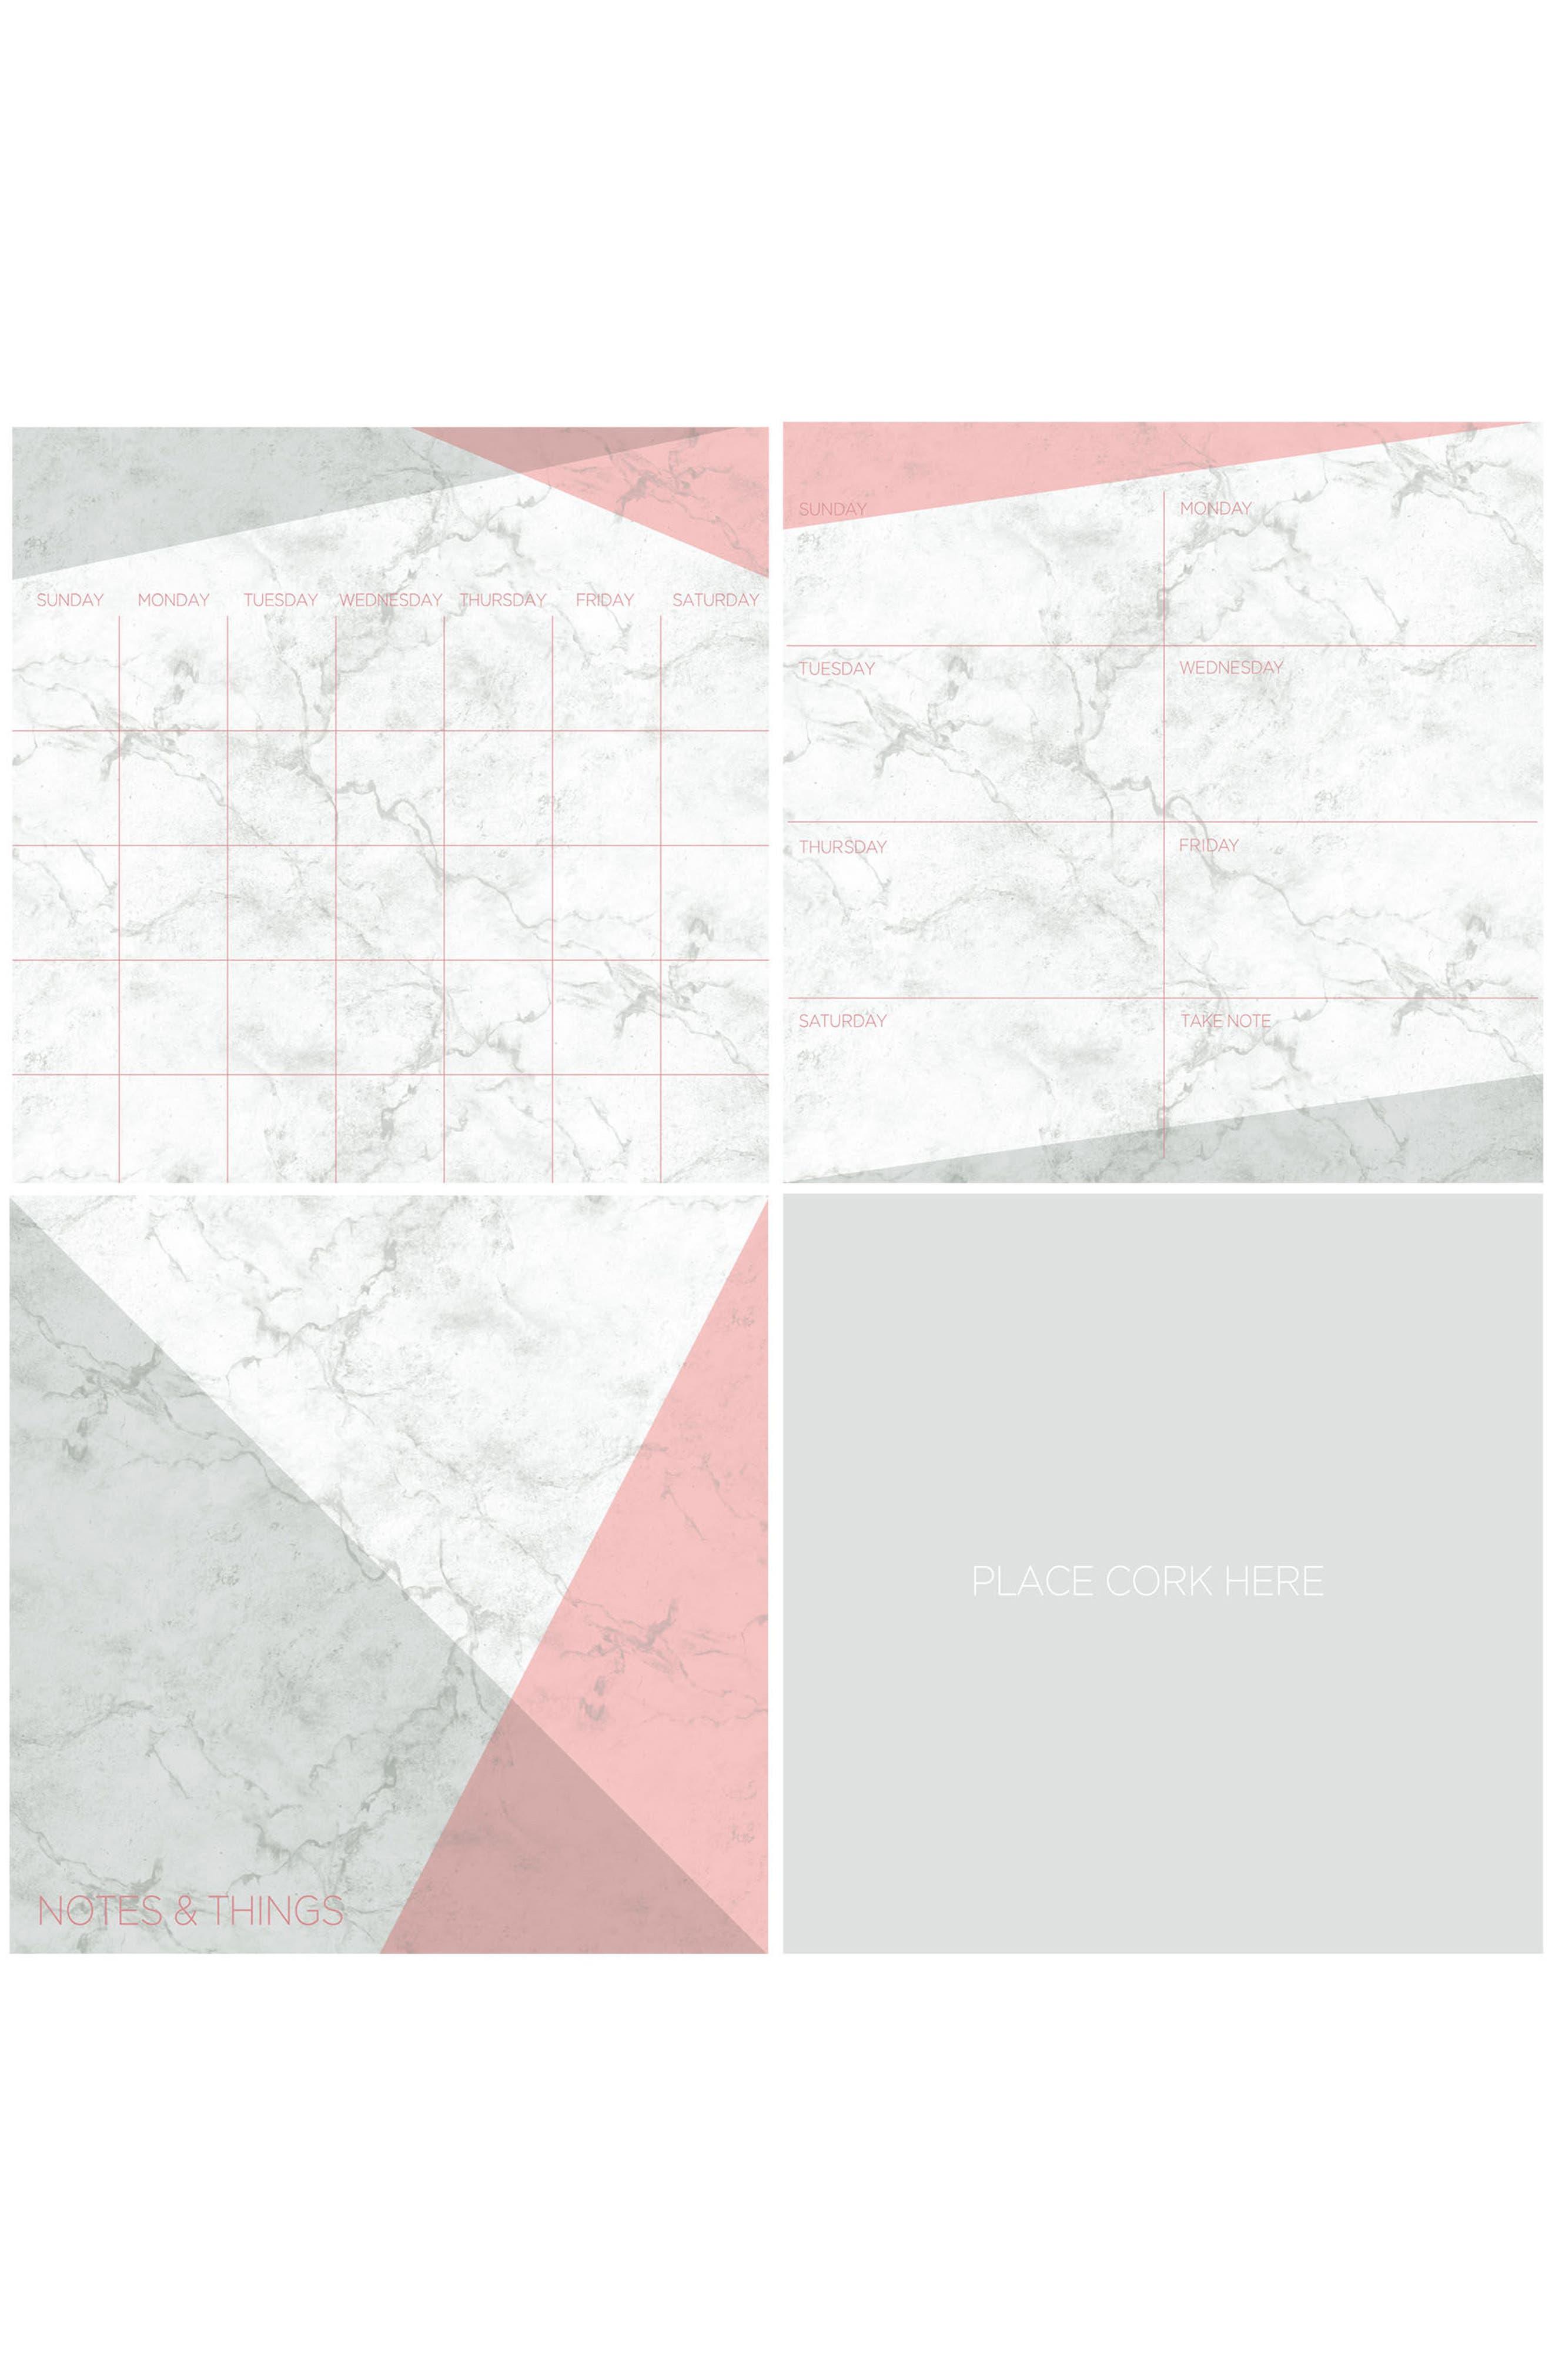 Main Image - Wallpops Everest Wall Decal Organization Kit